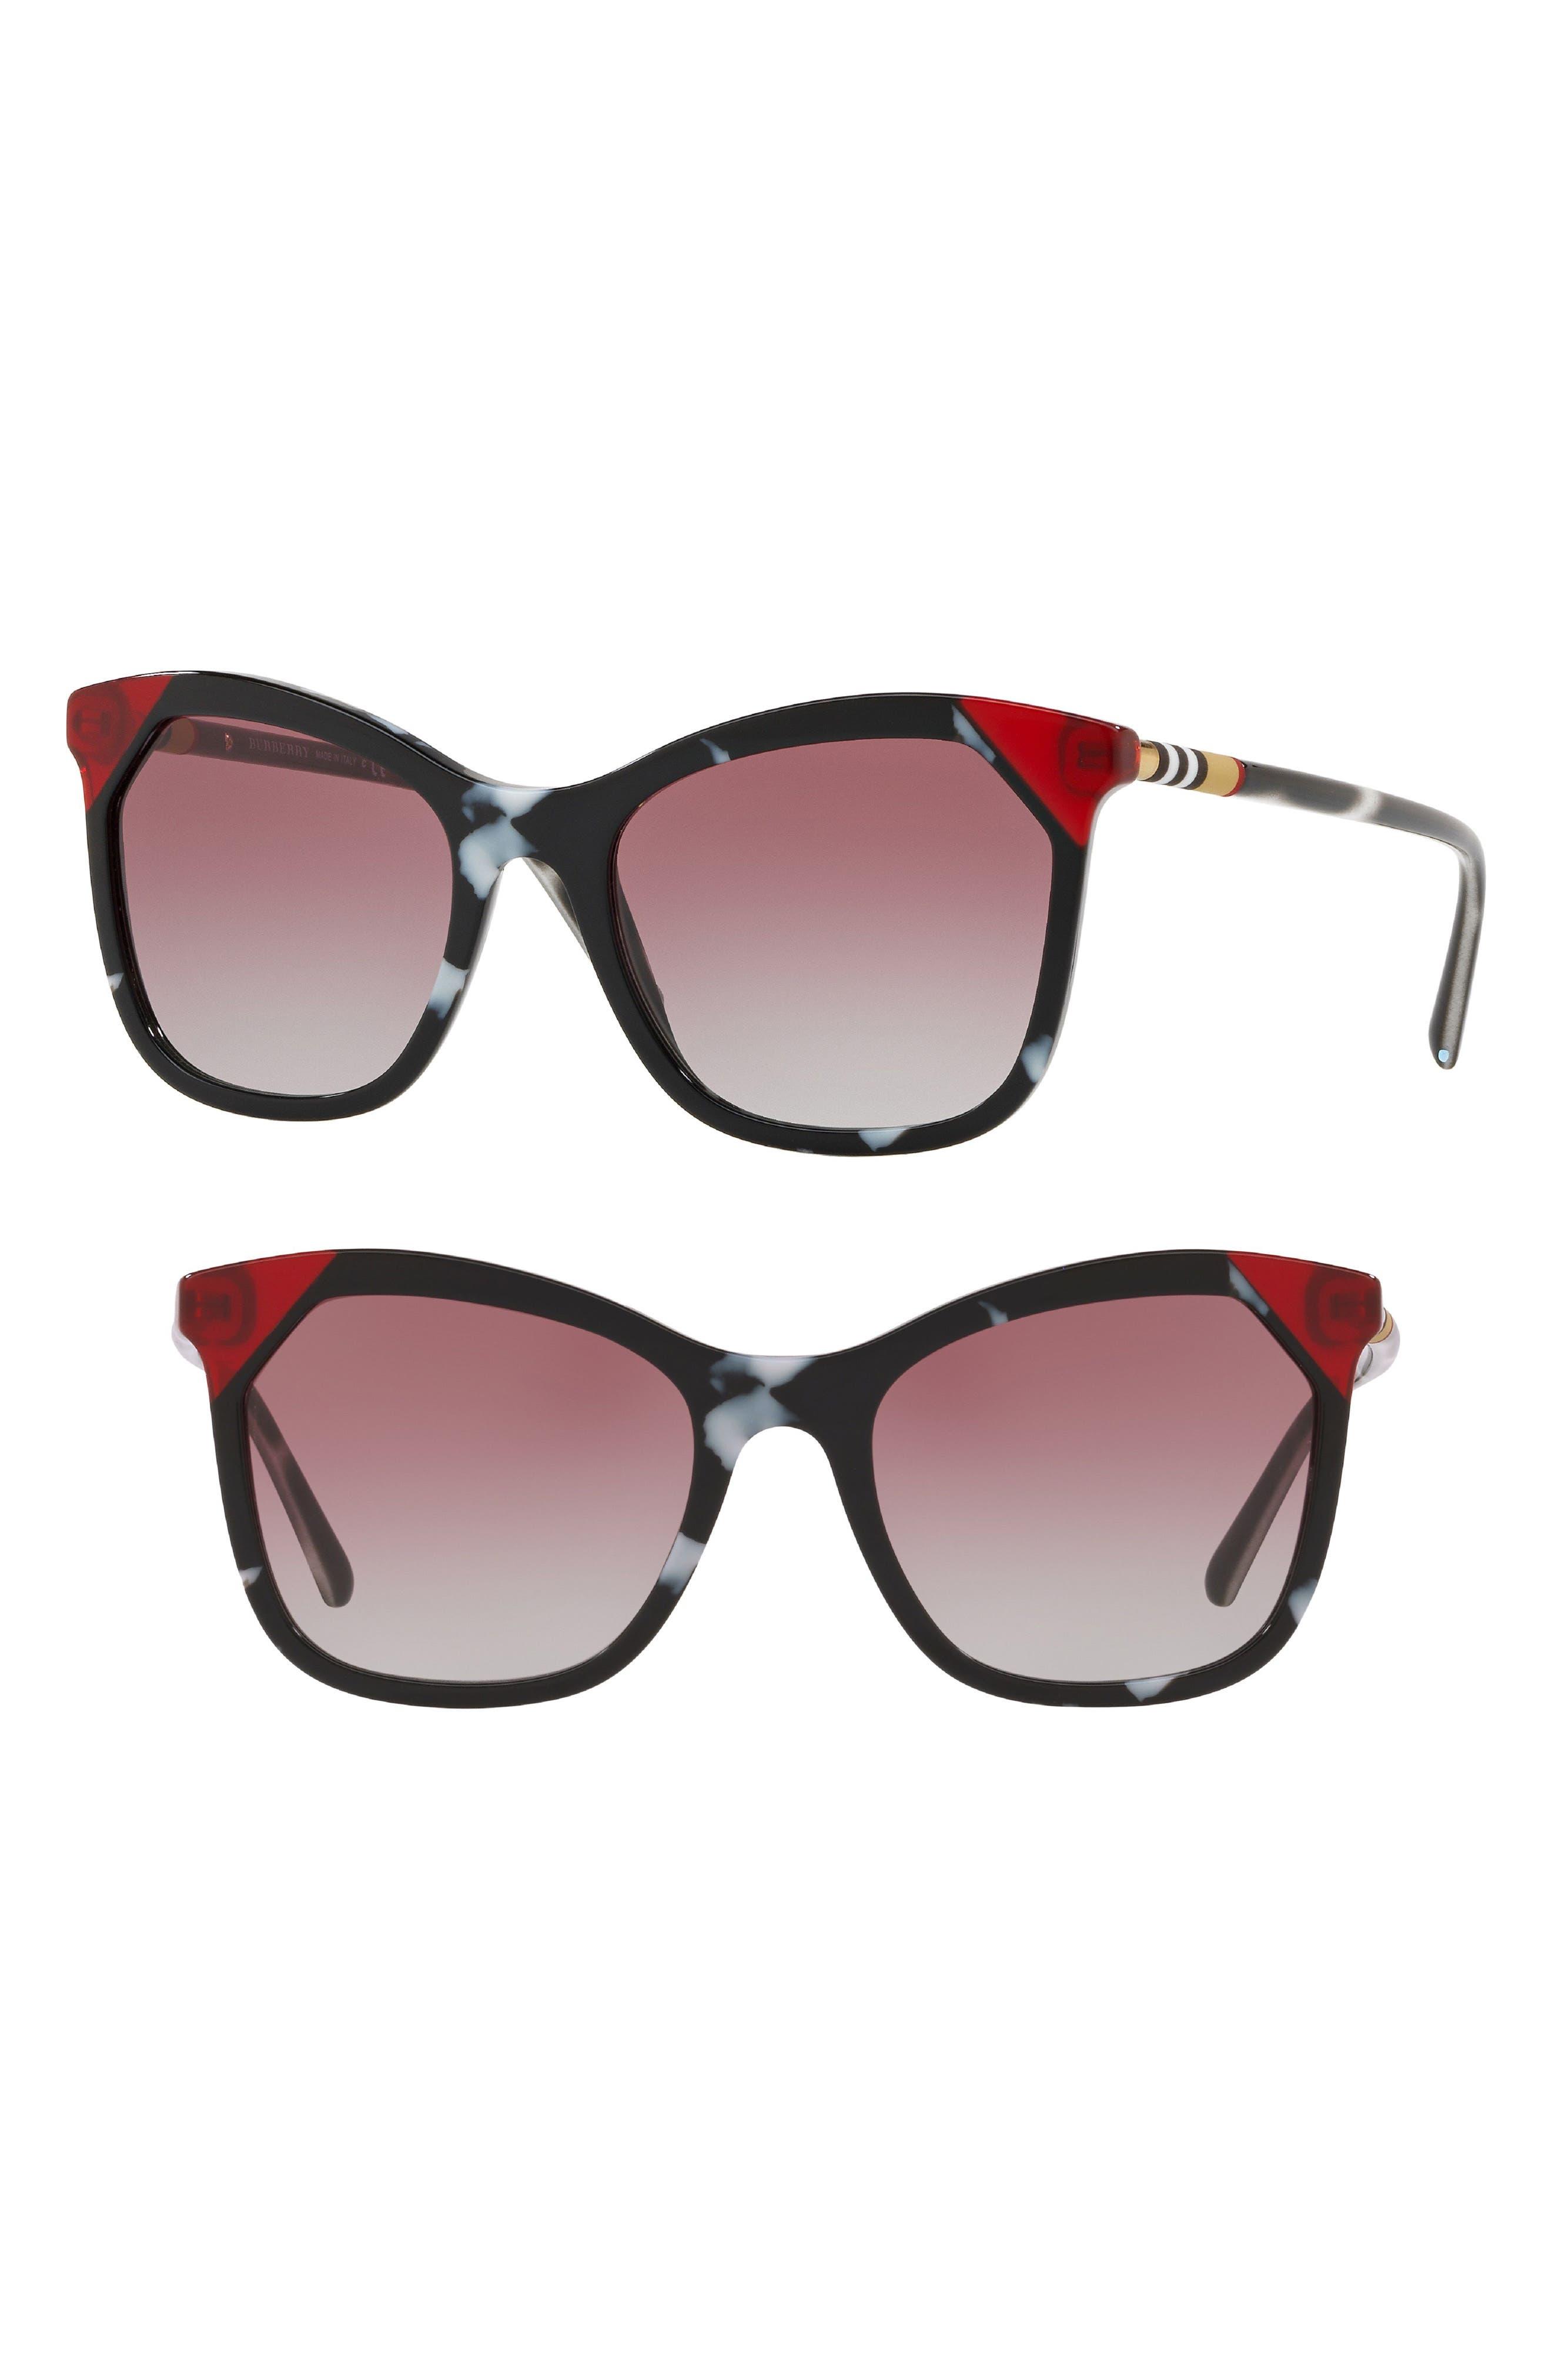 Heritage 54mm Square Sunglasses,                         Main,                         color, 111